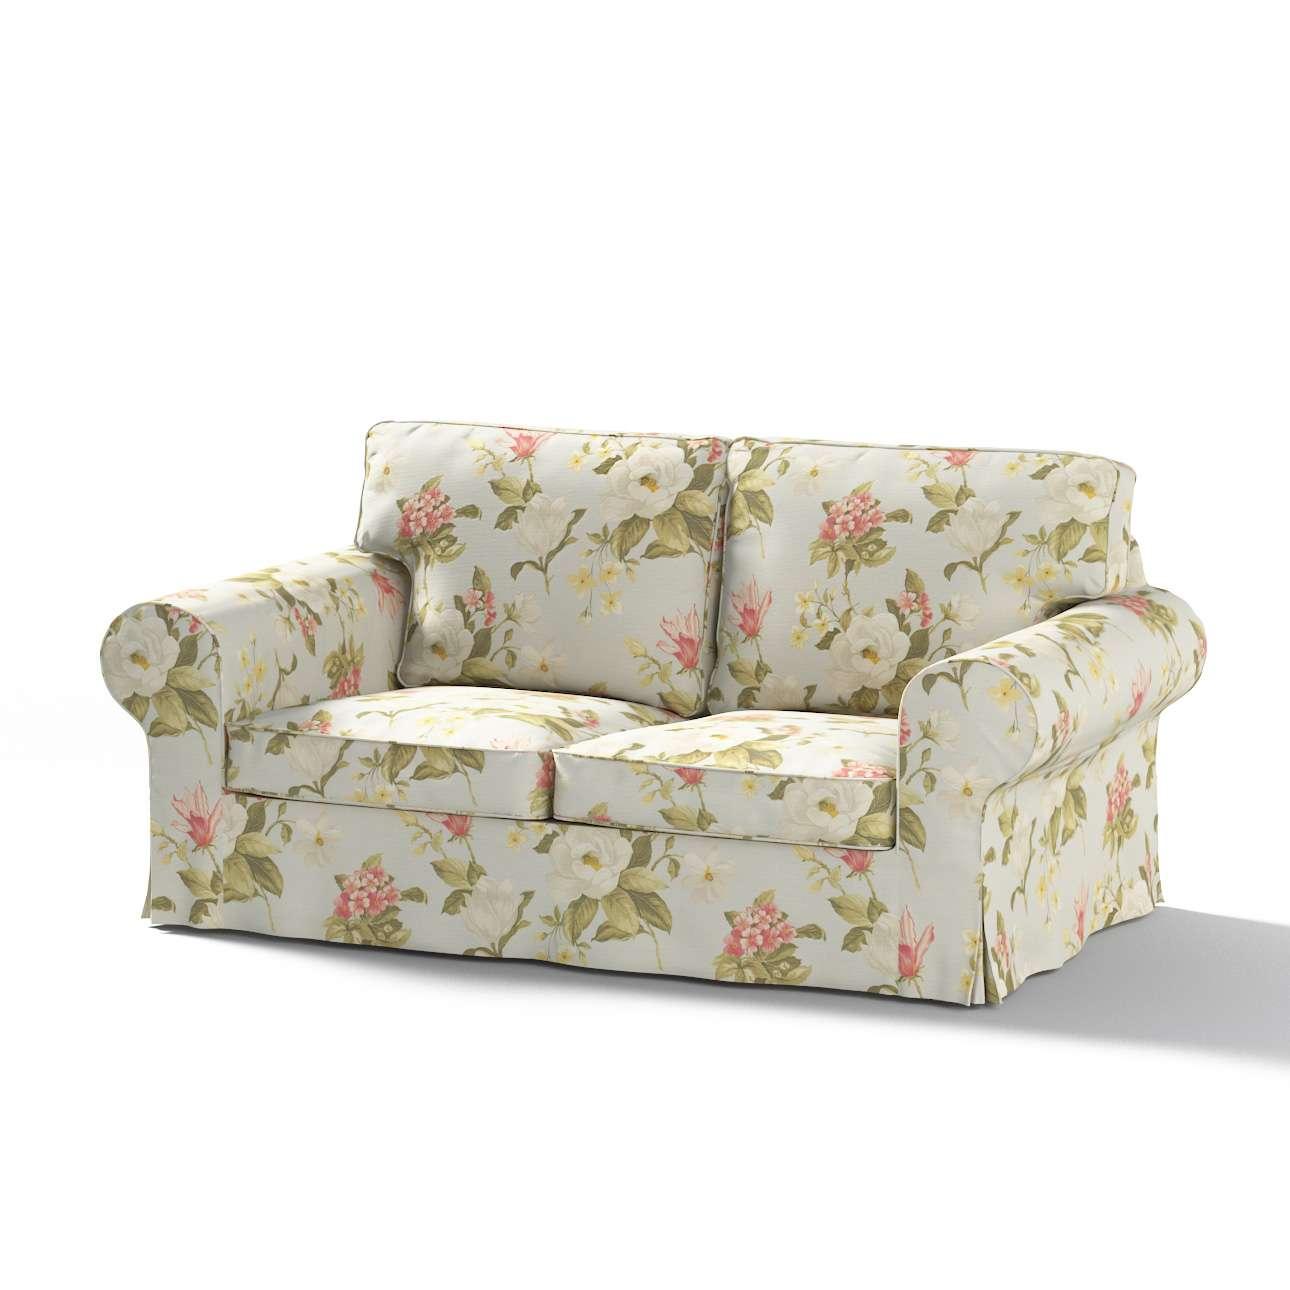 Ektorp 2-Sitzer Schlafsofabezug  ALTES Modell Sofabezug Ektorp 2-Sitzer Schlafsofa altes Modell von der Kollektion Londres, Stoff: 123-65